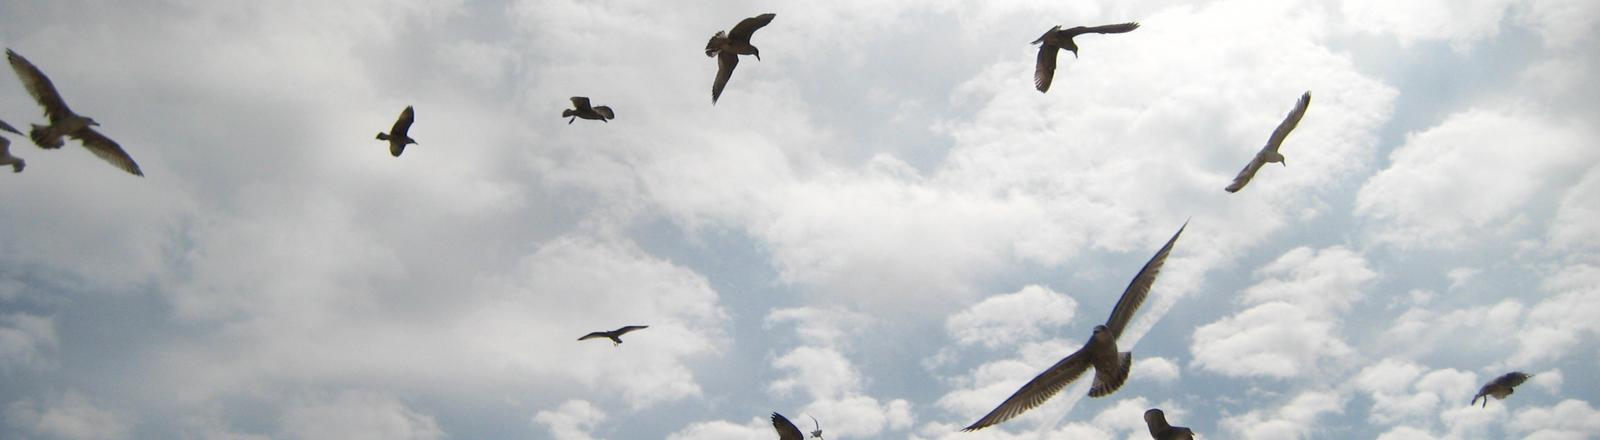 Vögel fliegen in der Luft